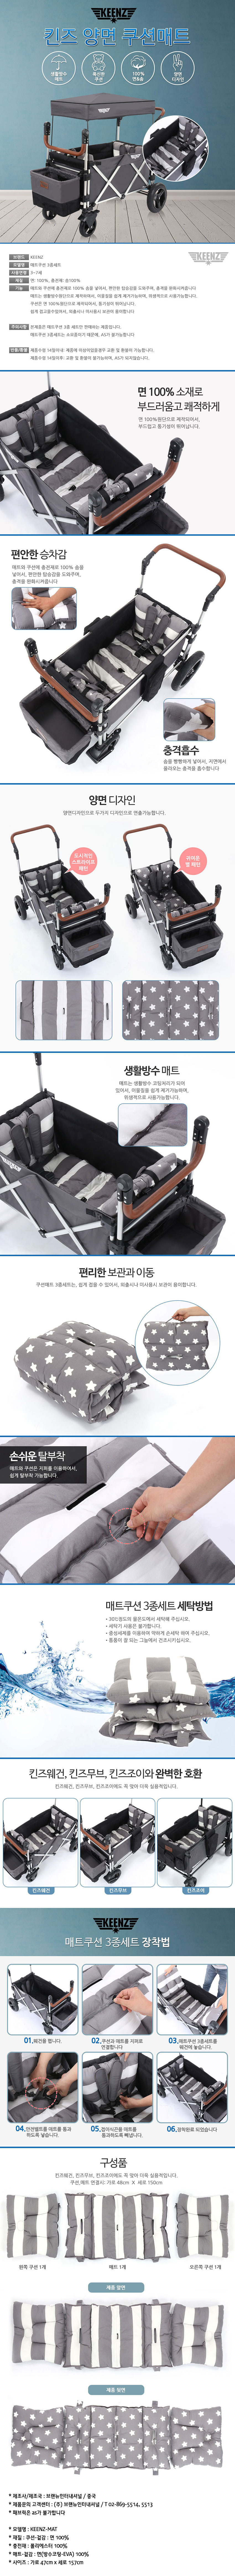 Keenz Wagon Moov Cushion Two-sided Mat Joy 100/% Cotton Waterproof Gray